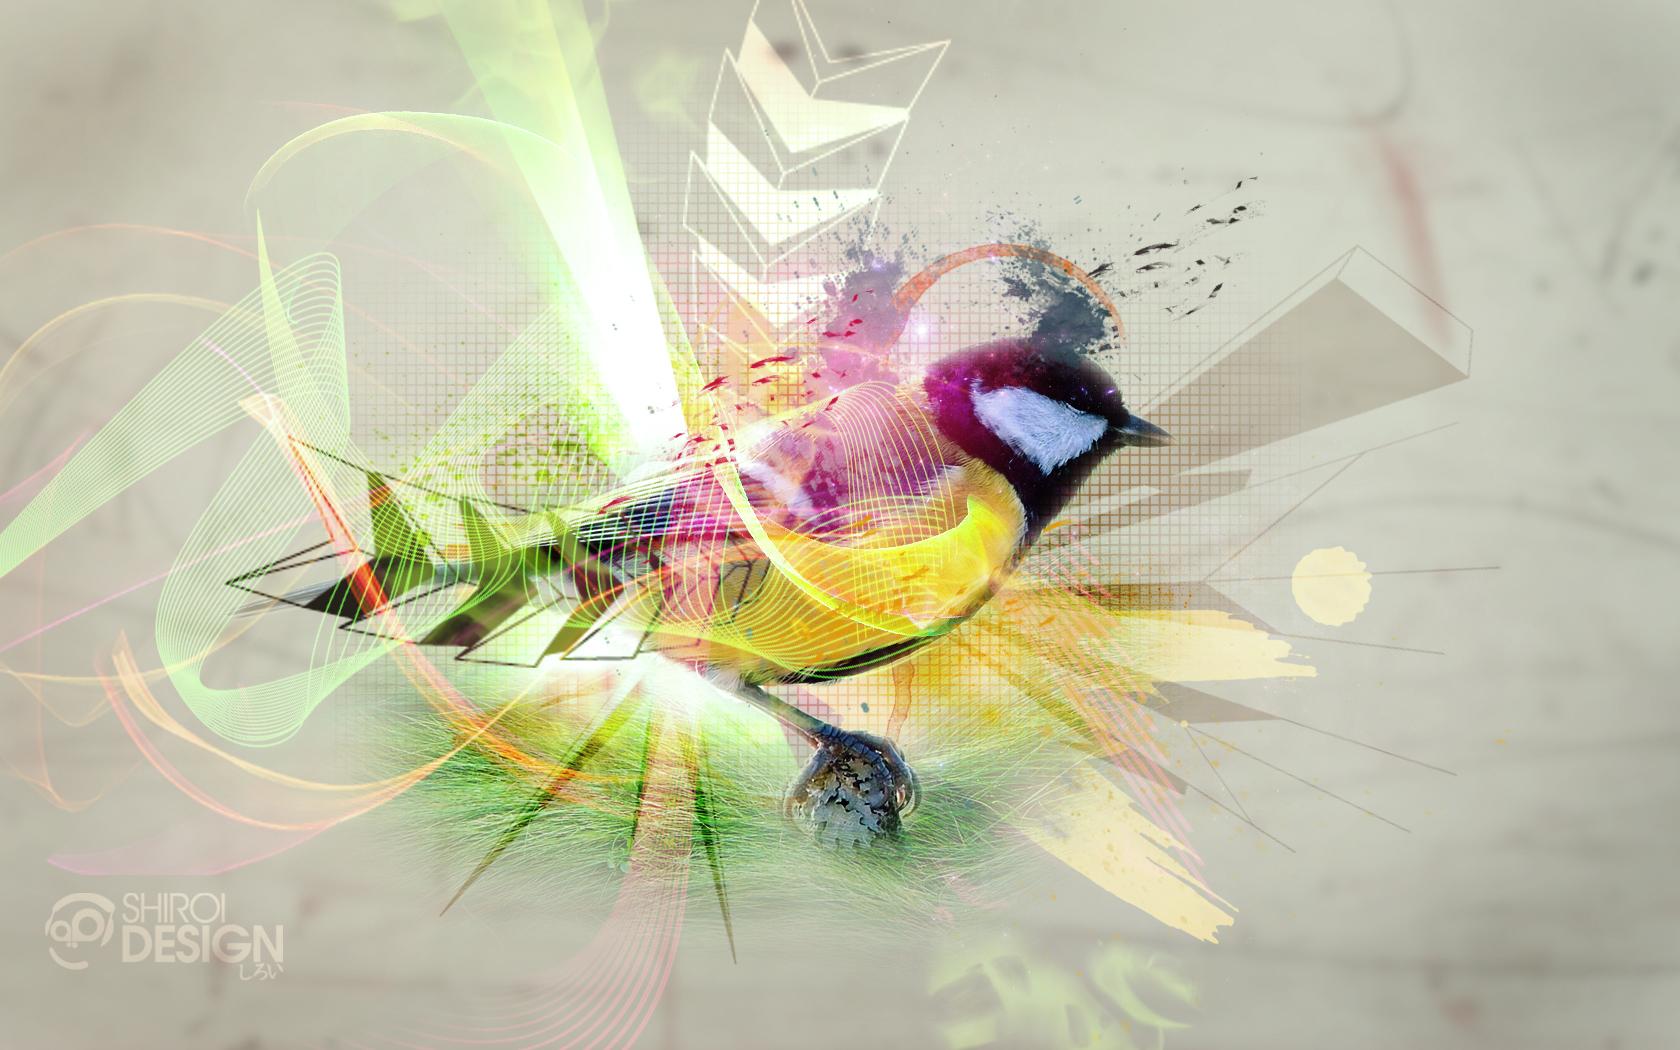 Wallpaper Geometric Hd Bird At Artwork Shiroi Design